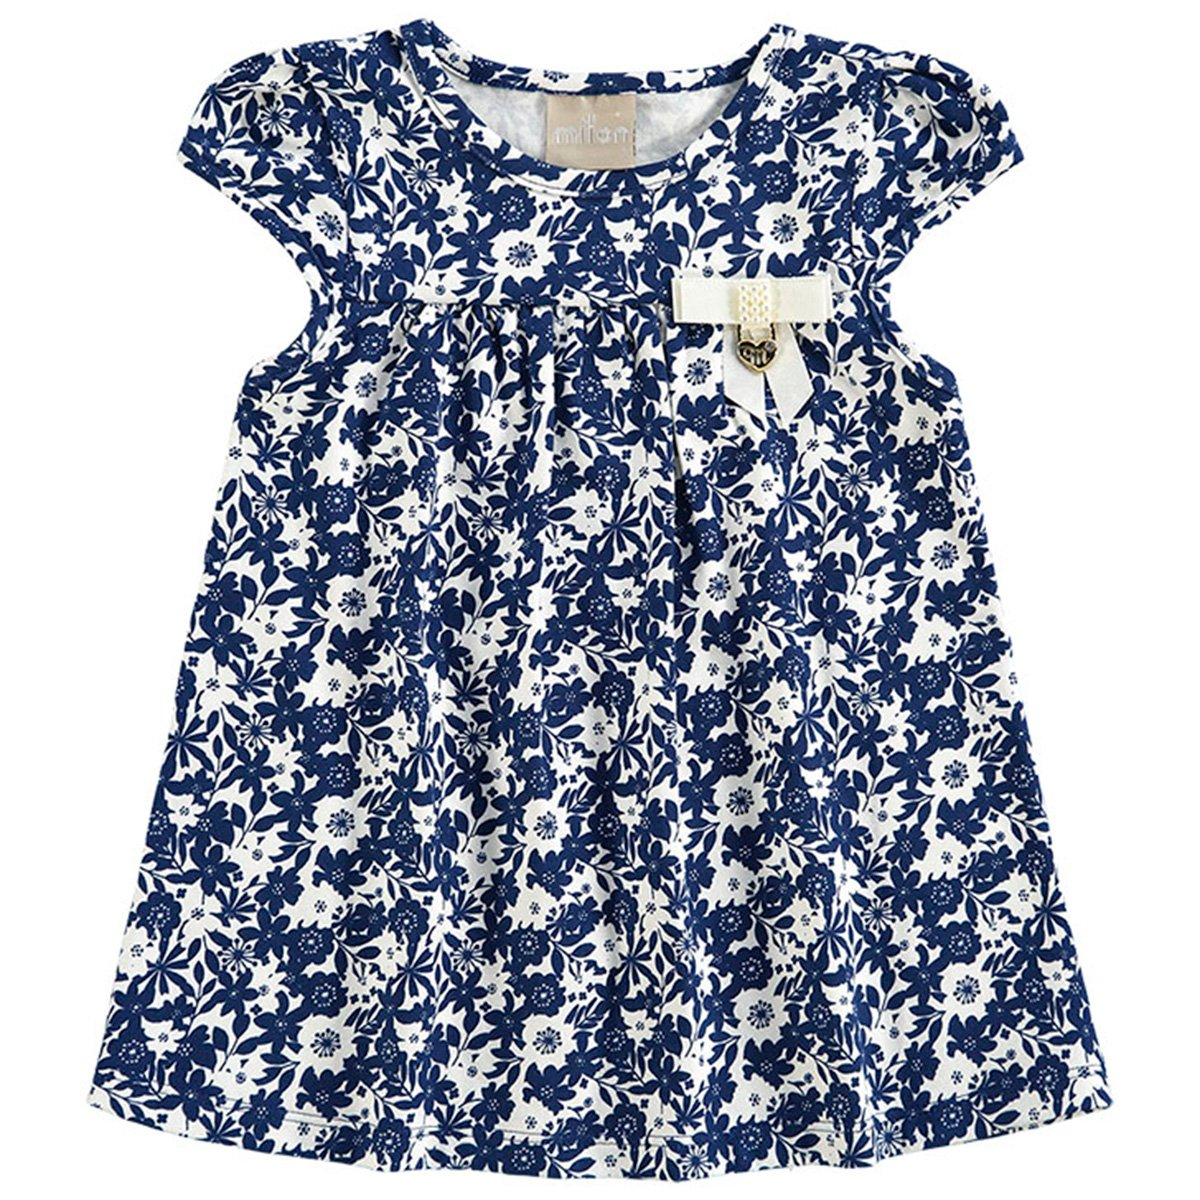 Milon Milon Azul Estampada Feminina Blusa Infantil Blusa Bata Infantil Lacinho 4IvxxZ